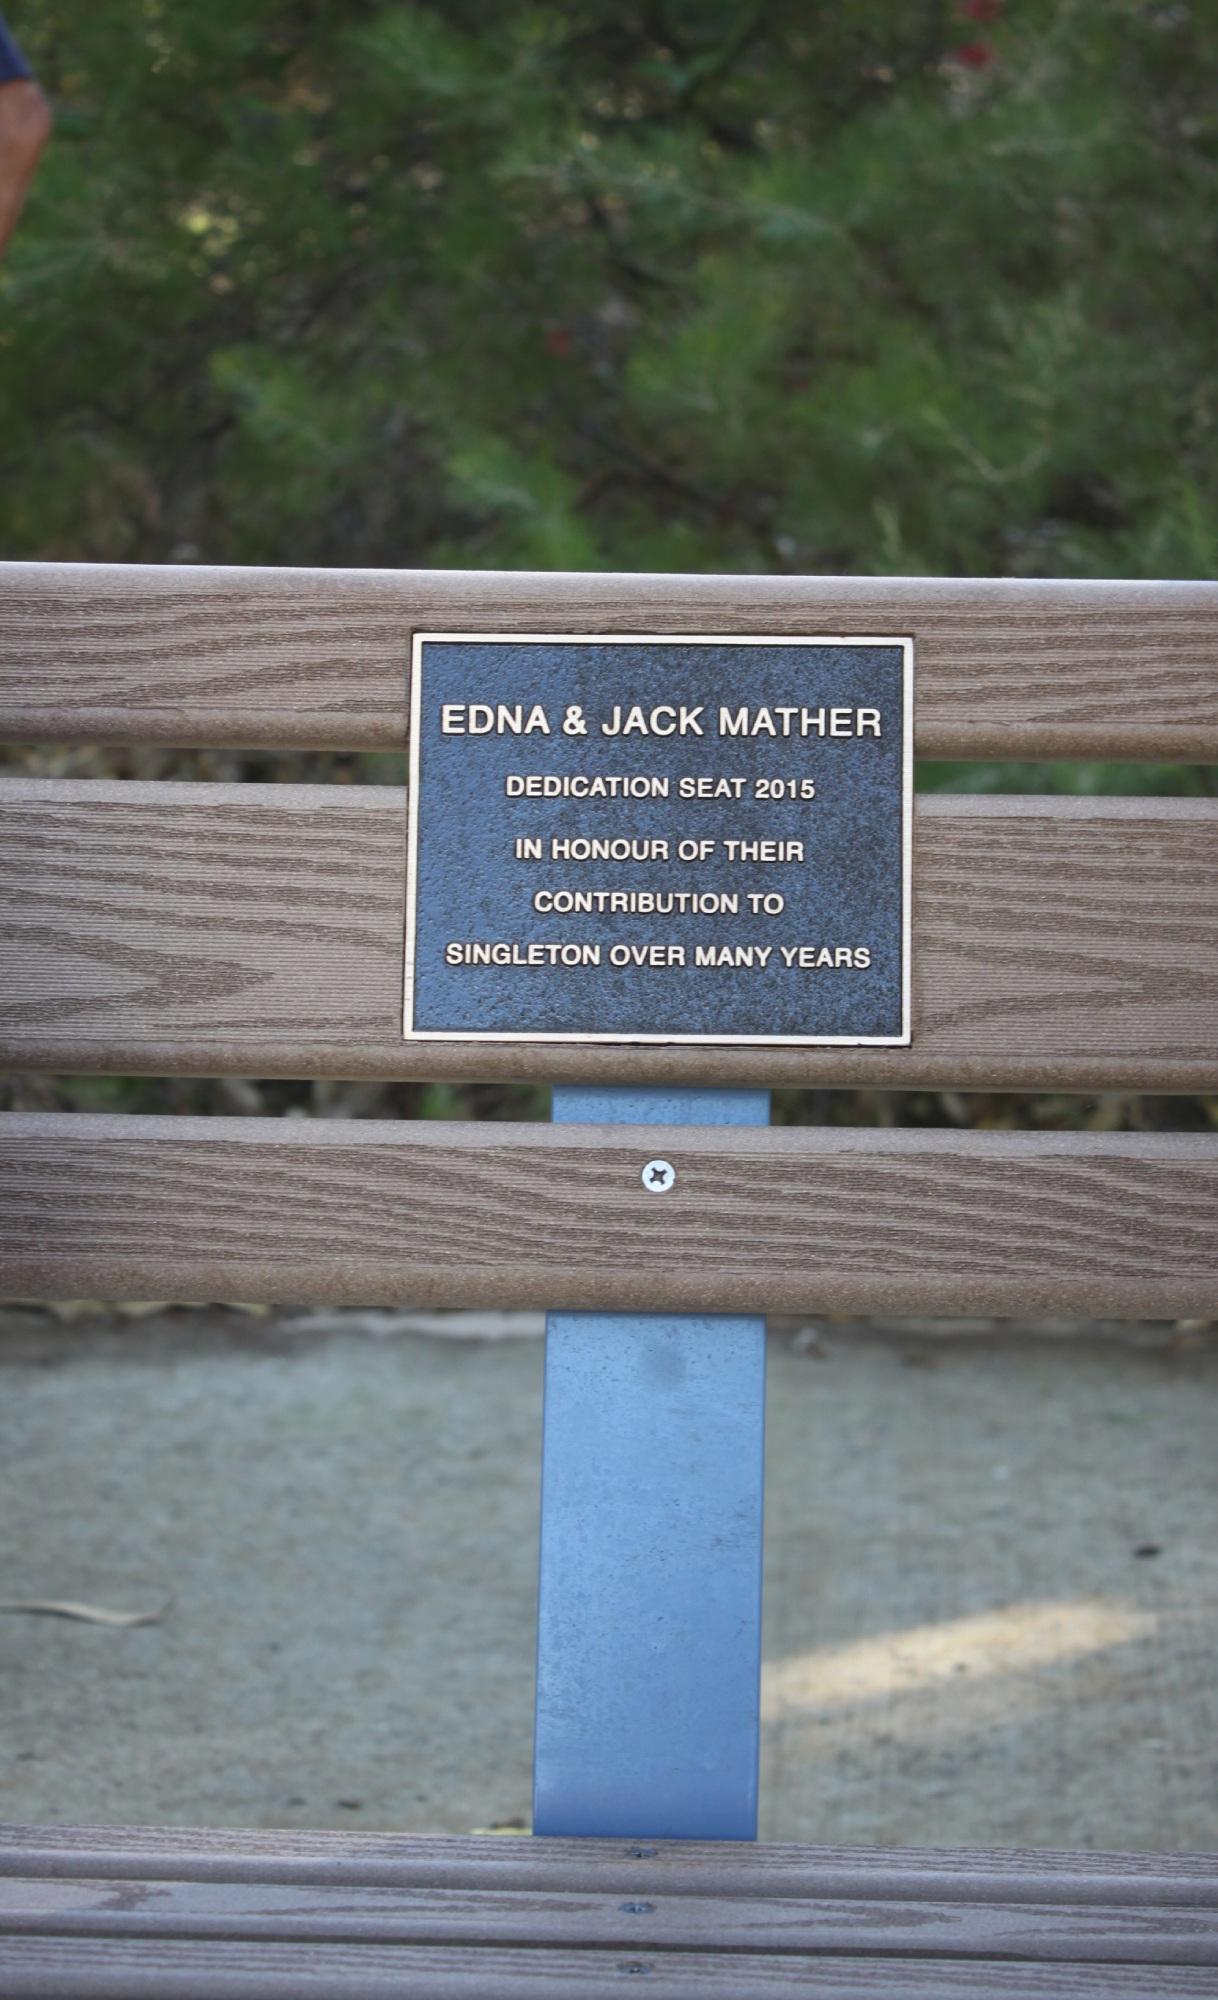 Singleton bench named after Jack and Edna Mather